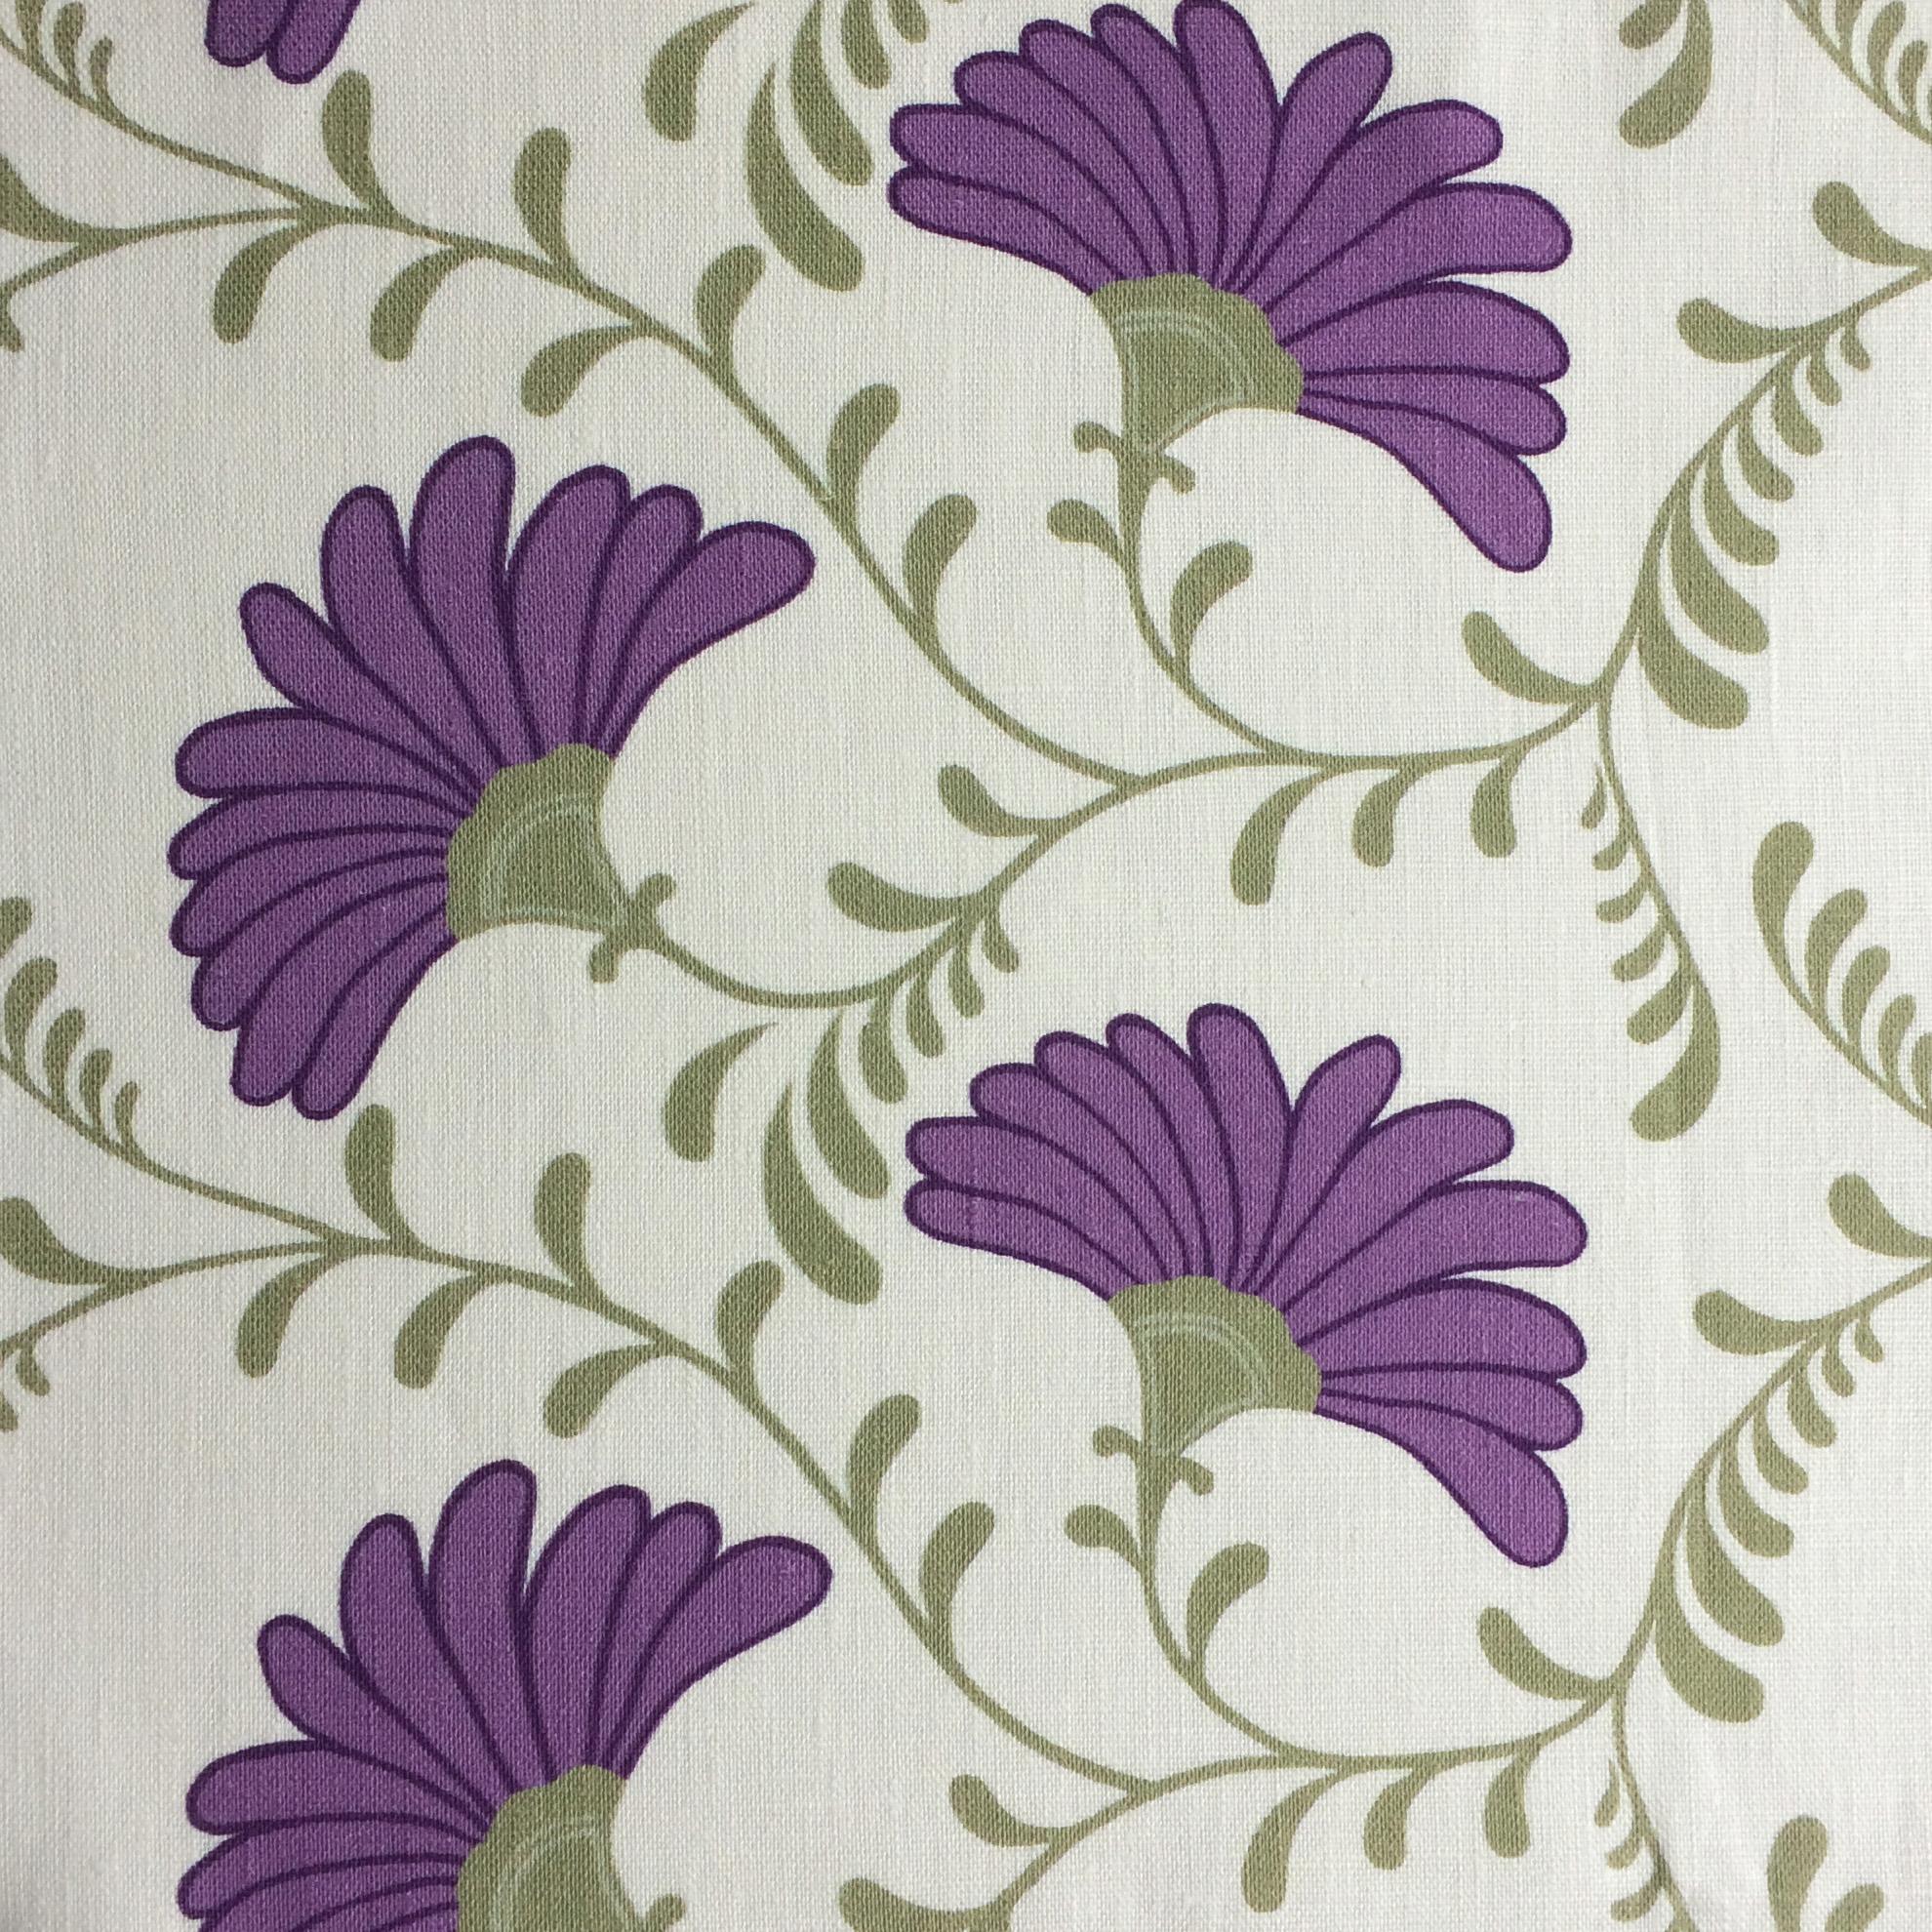 Big Posies: Lilac